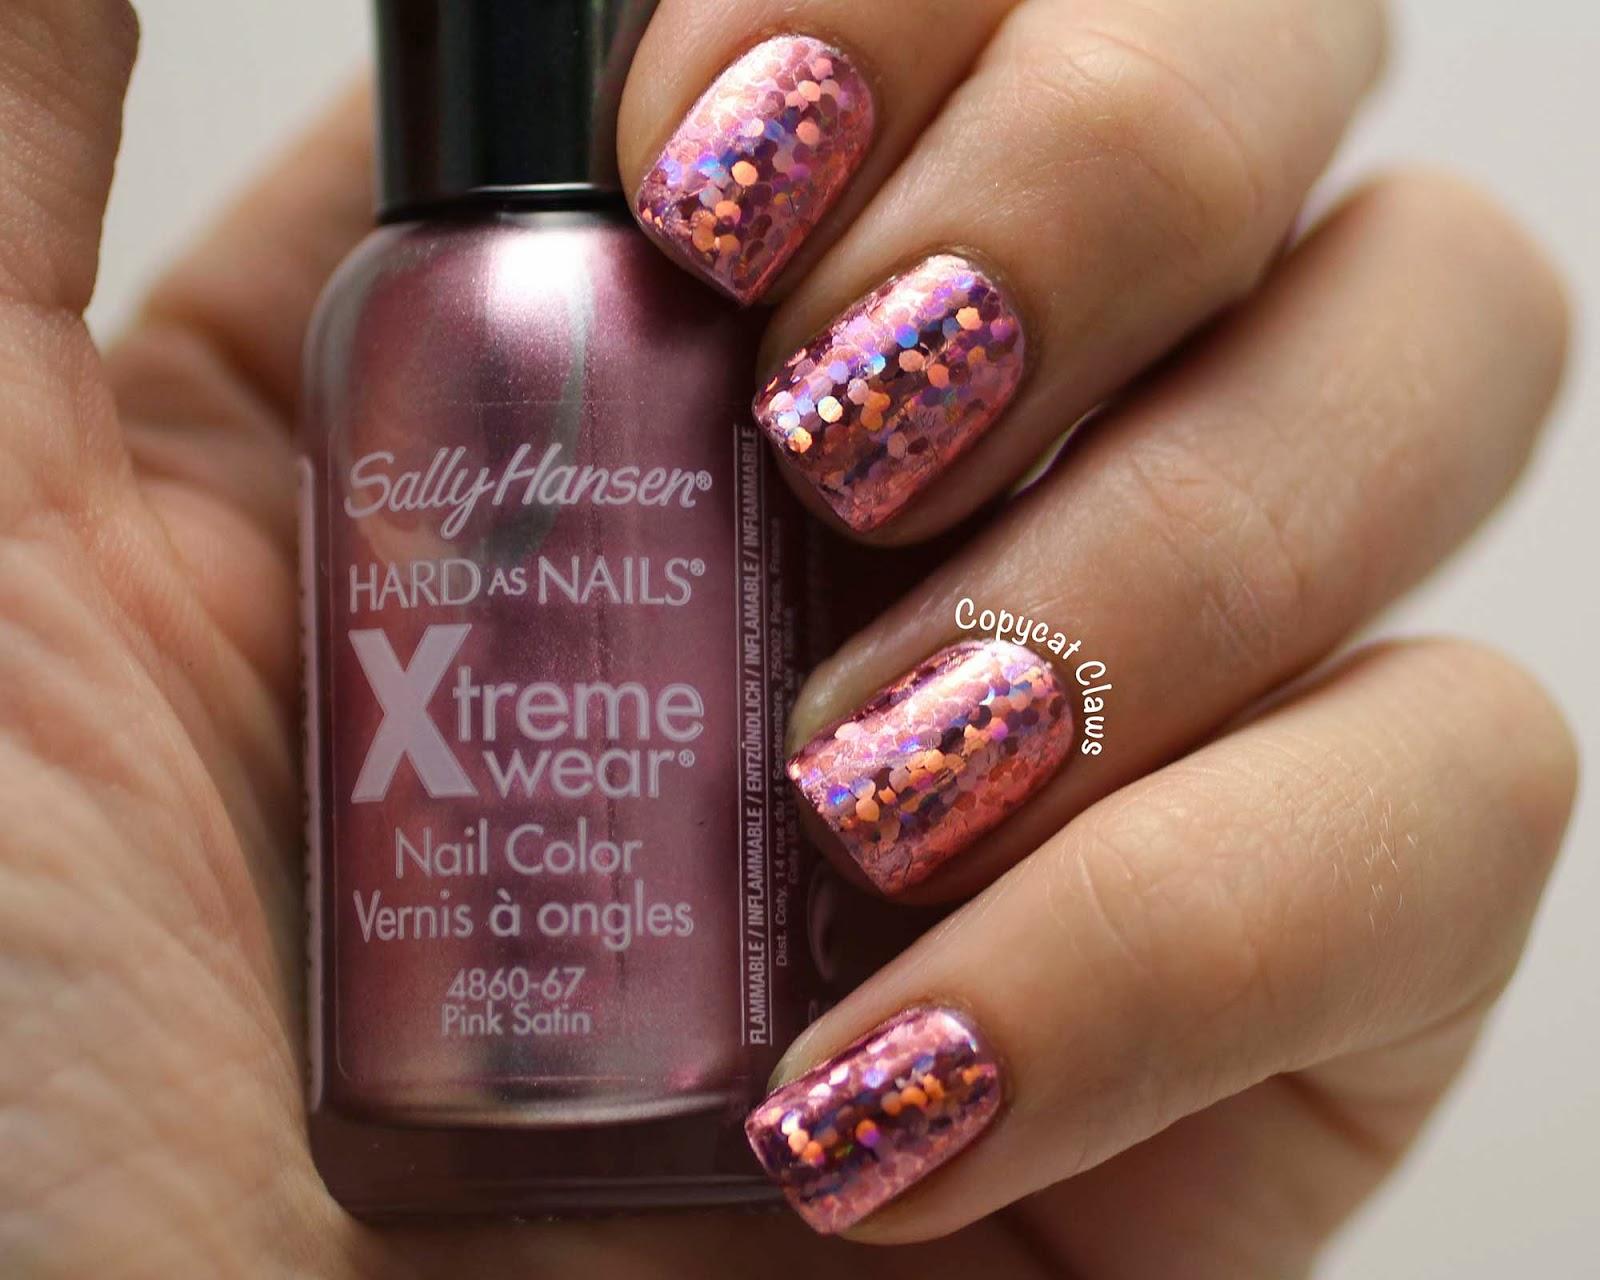 Copycat Claws: Pink Shiny Nail Foils